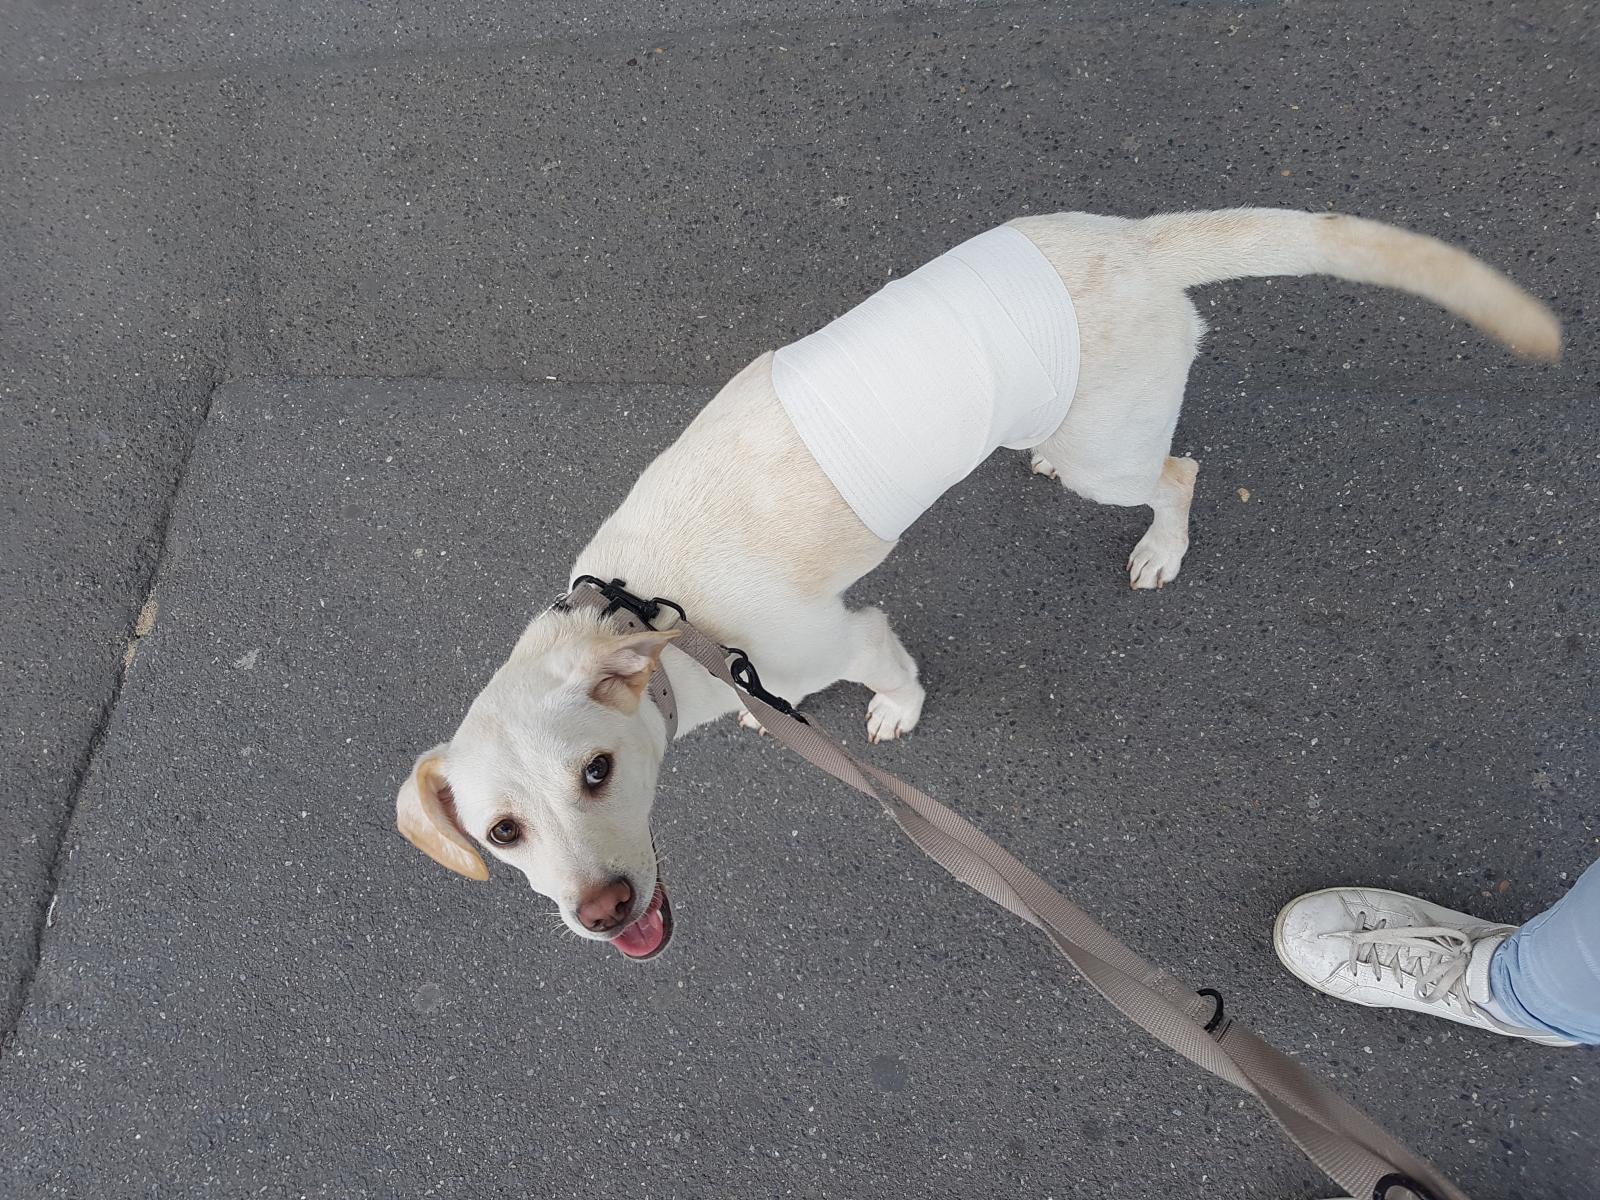 Malinka sort de clinique vétérinaire